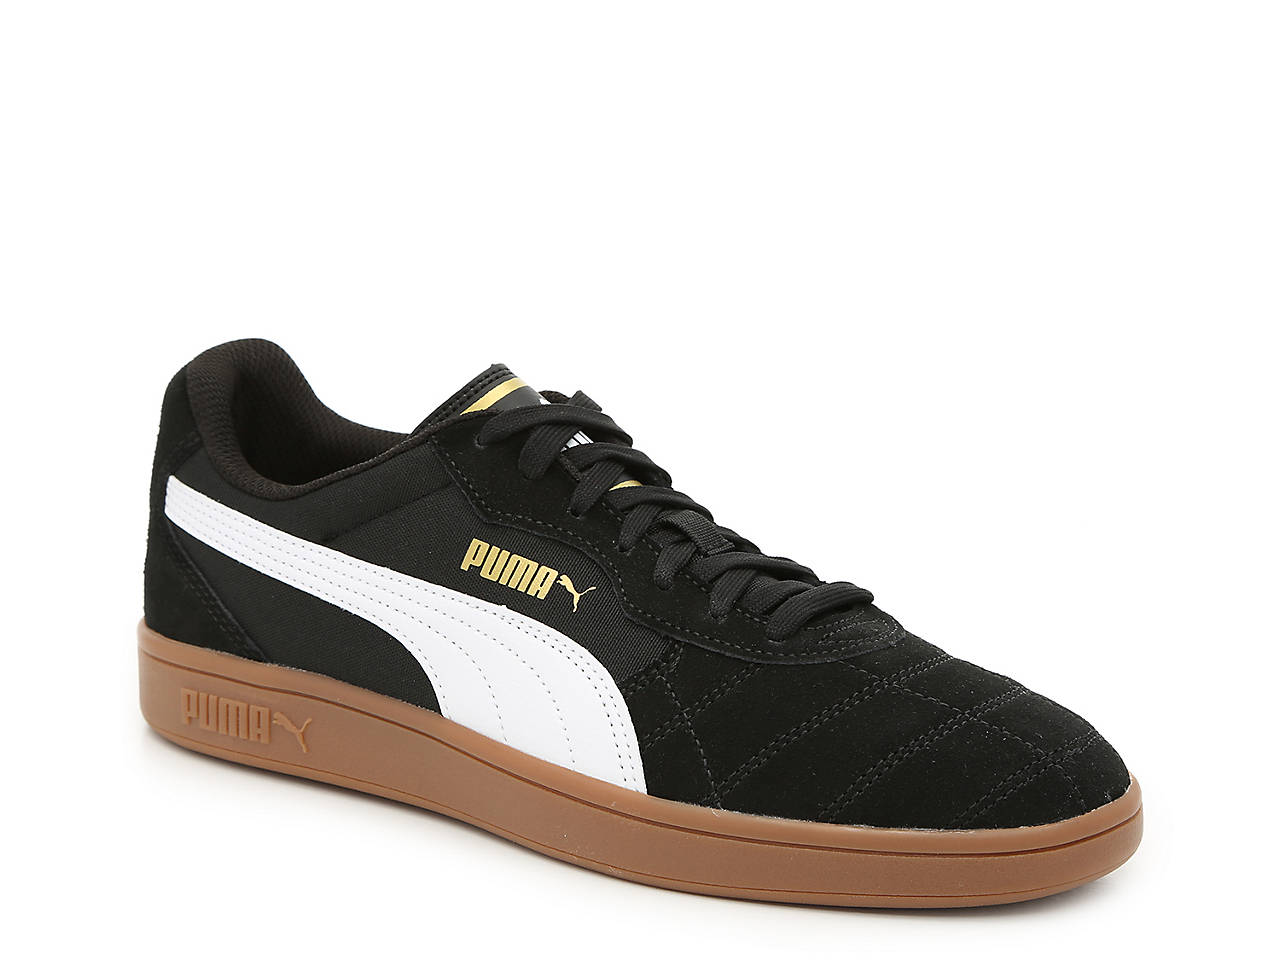 Trainers | Men's Shoes | Gucci